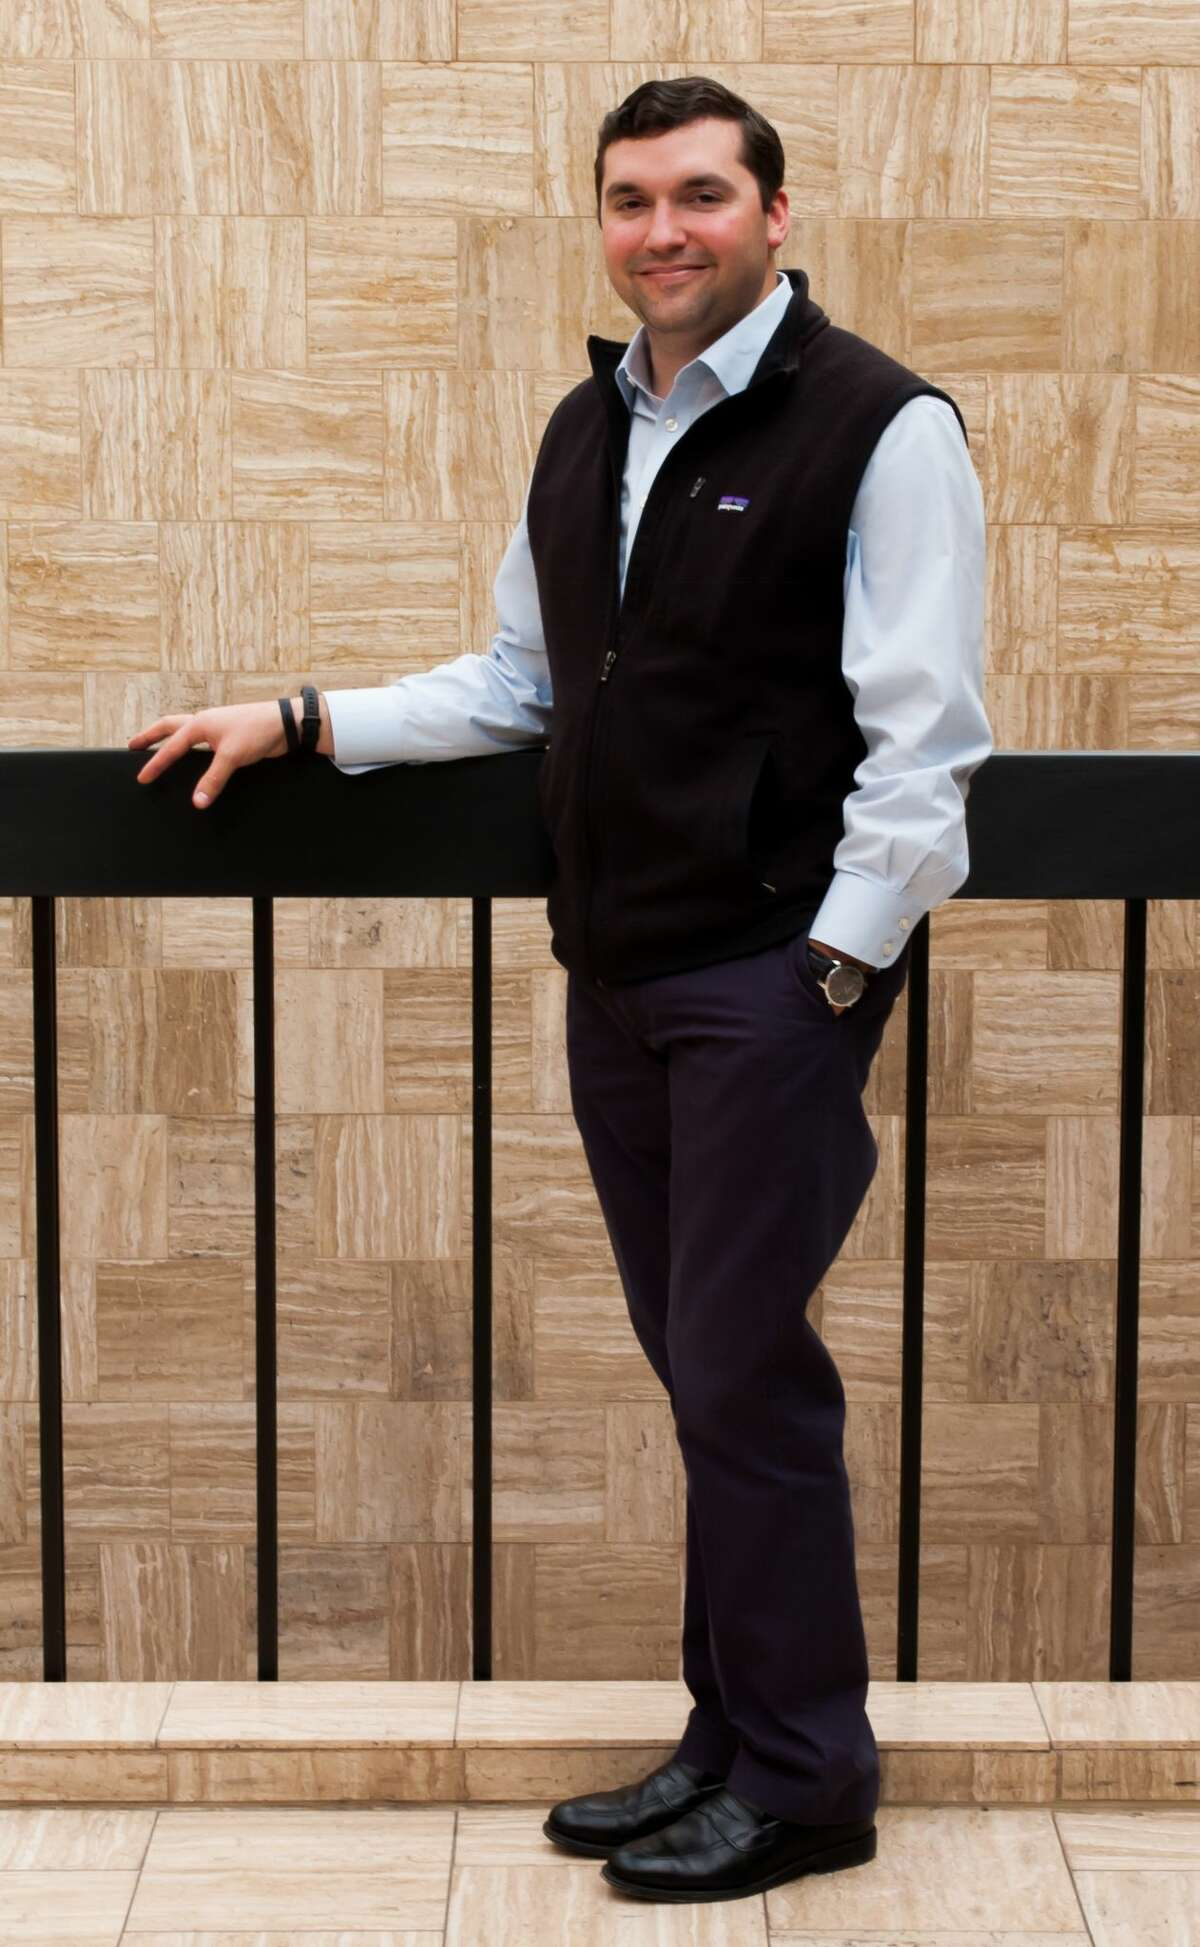 Zachary Jetton, 25, ConocoPhillips Production Engineer